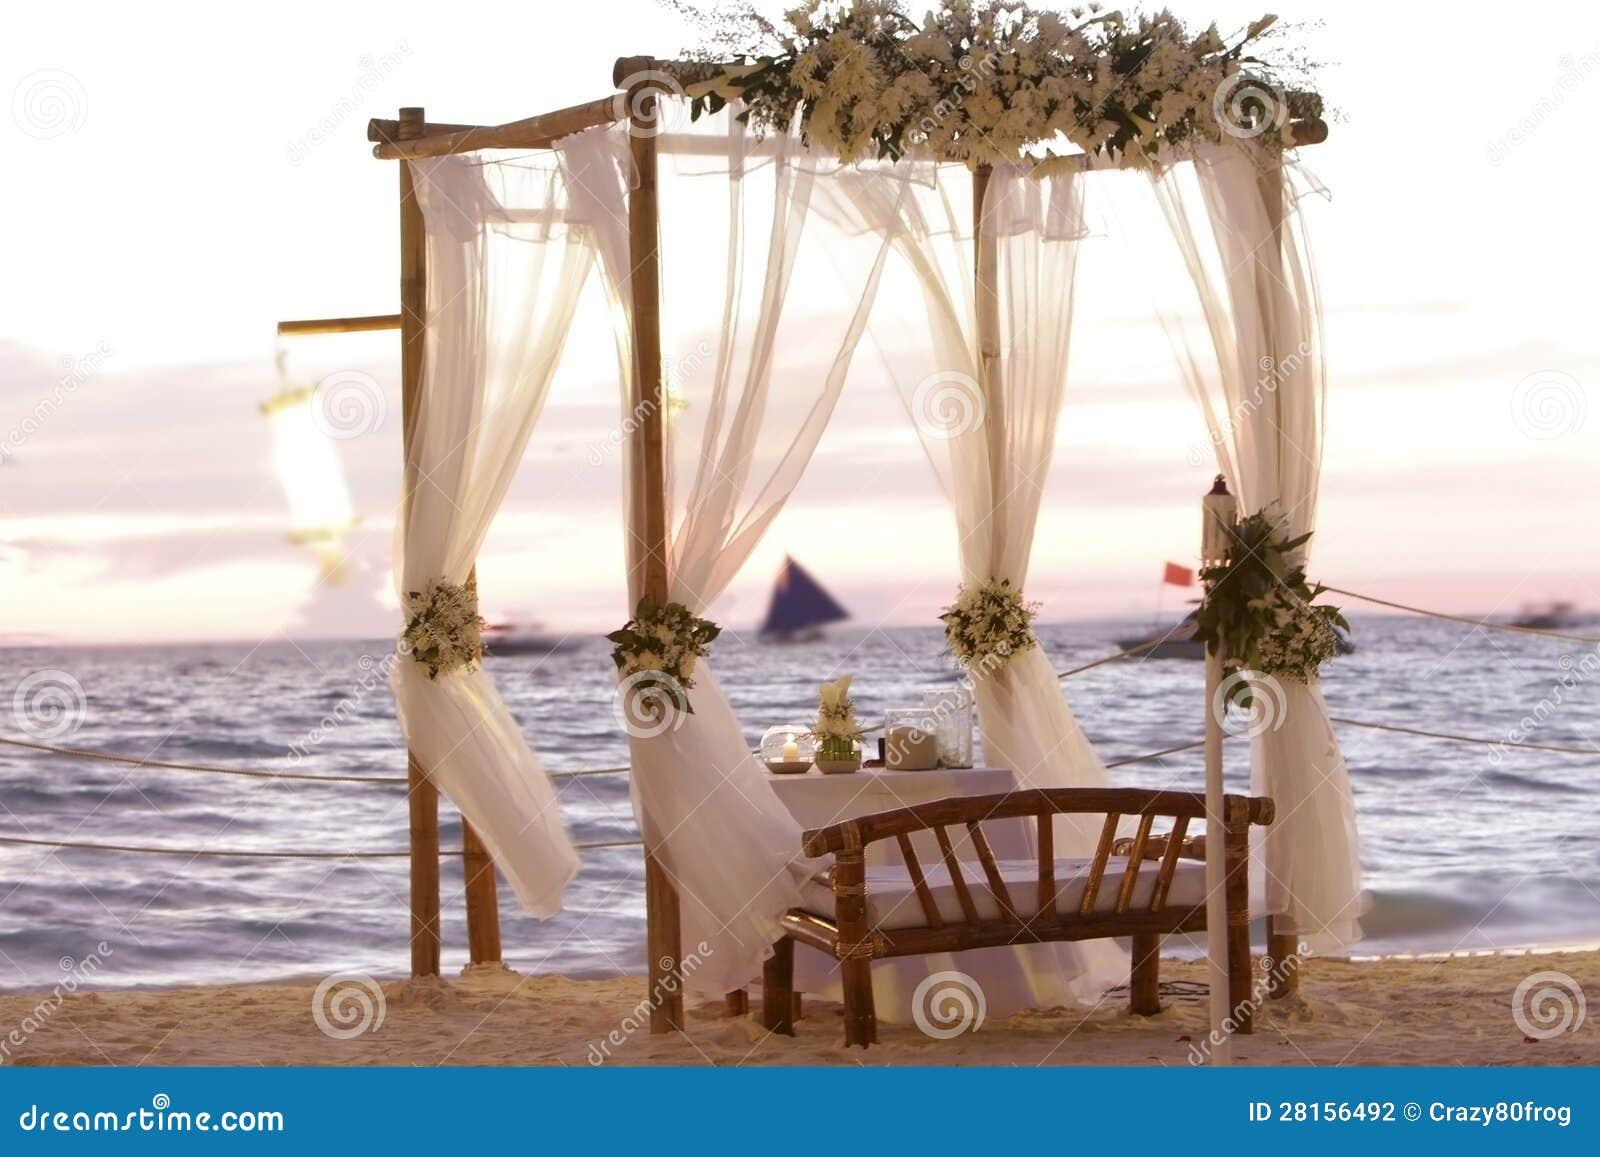 Wedding Table Decoration On Beach Stock Photo - Image ...